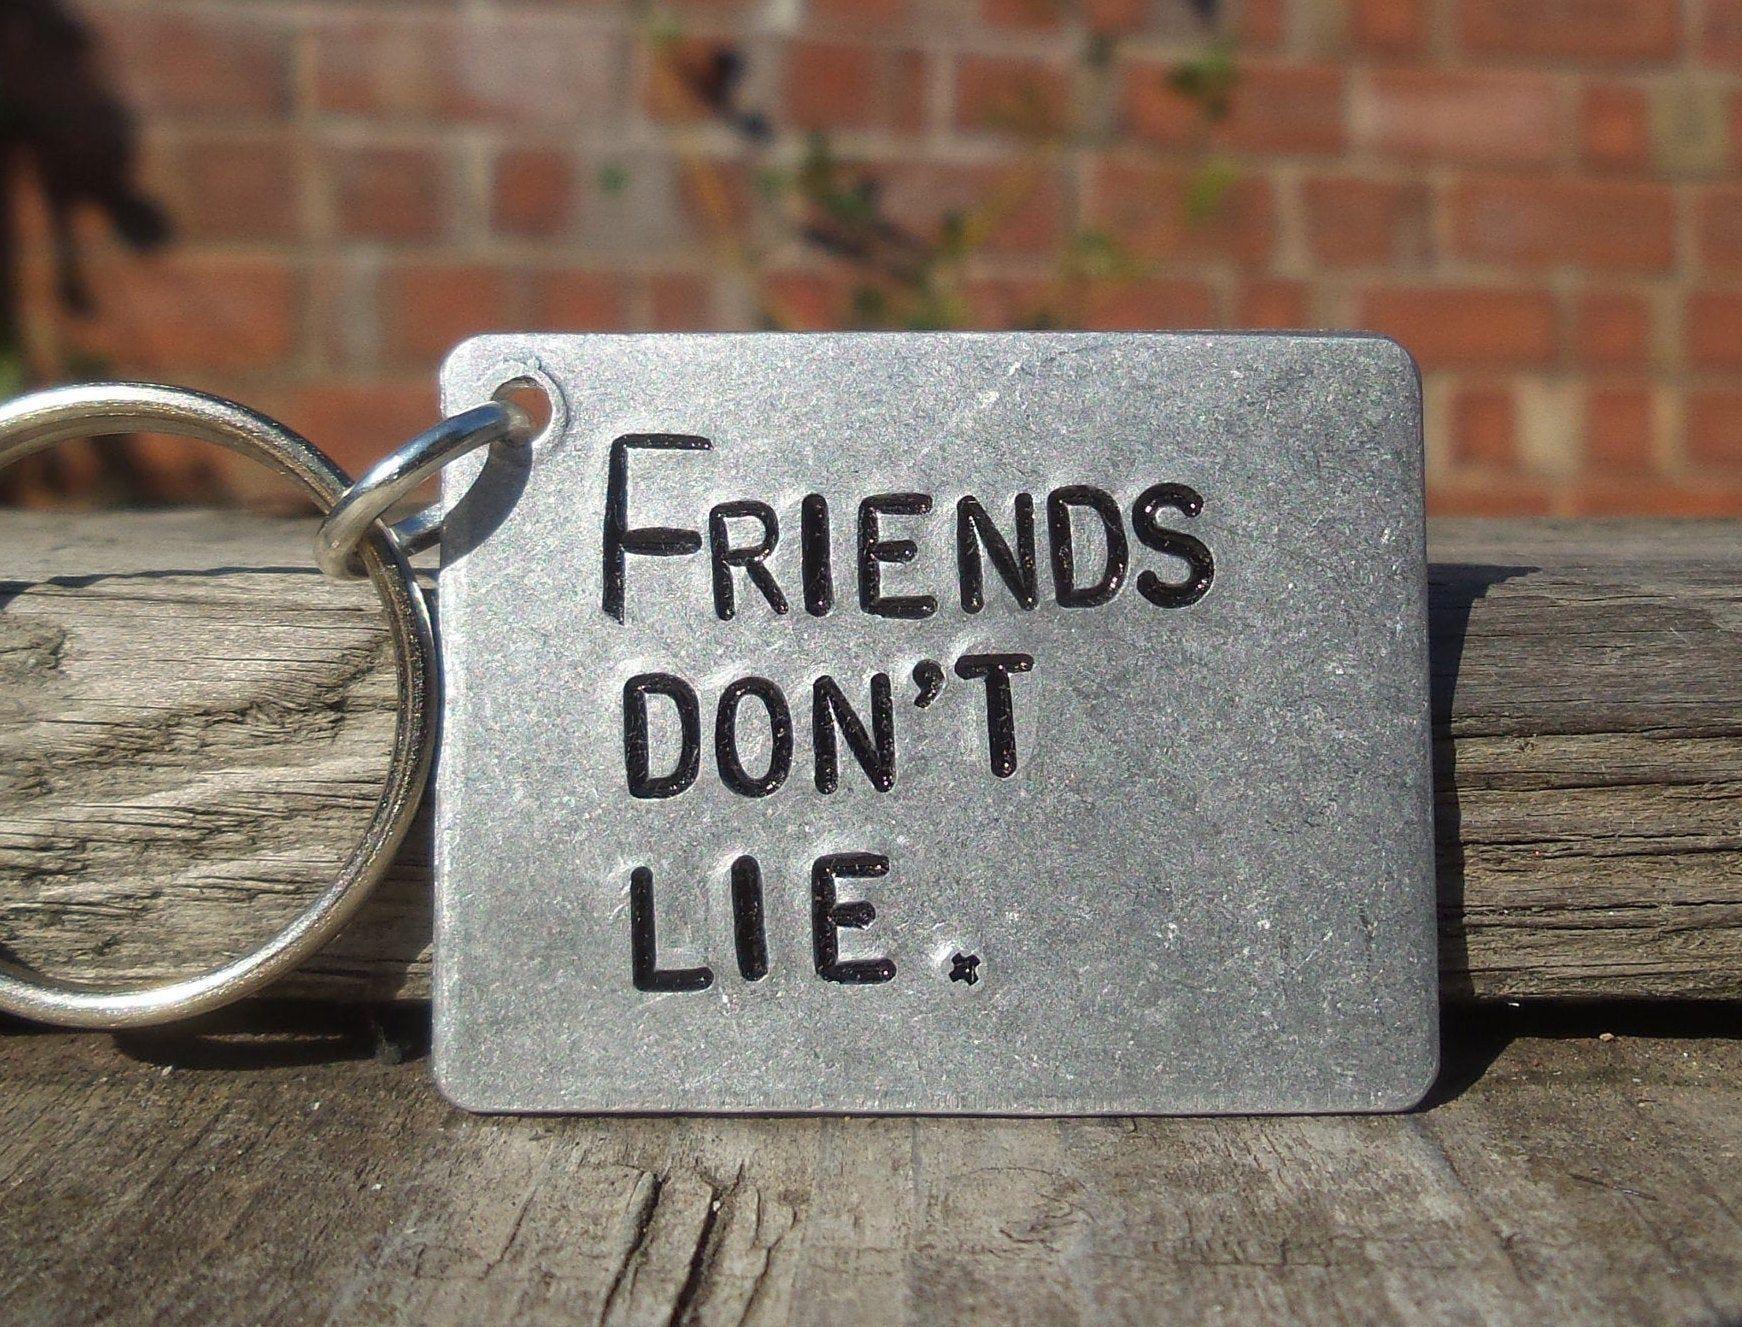 Friends dont lie stranger things boyfriend girlfriend